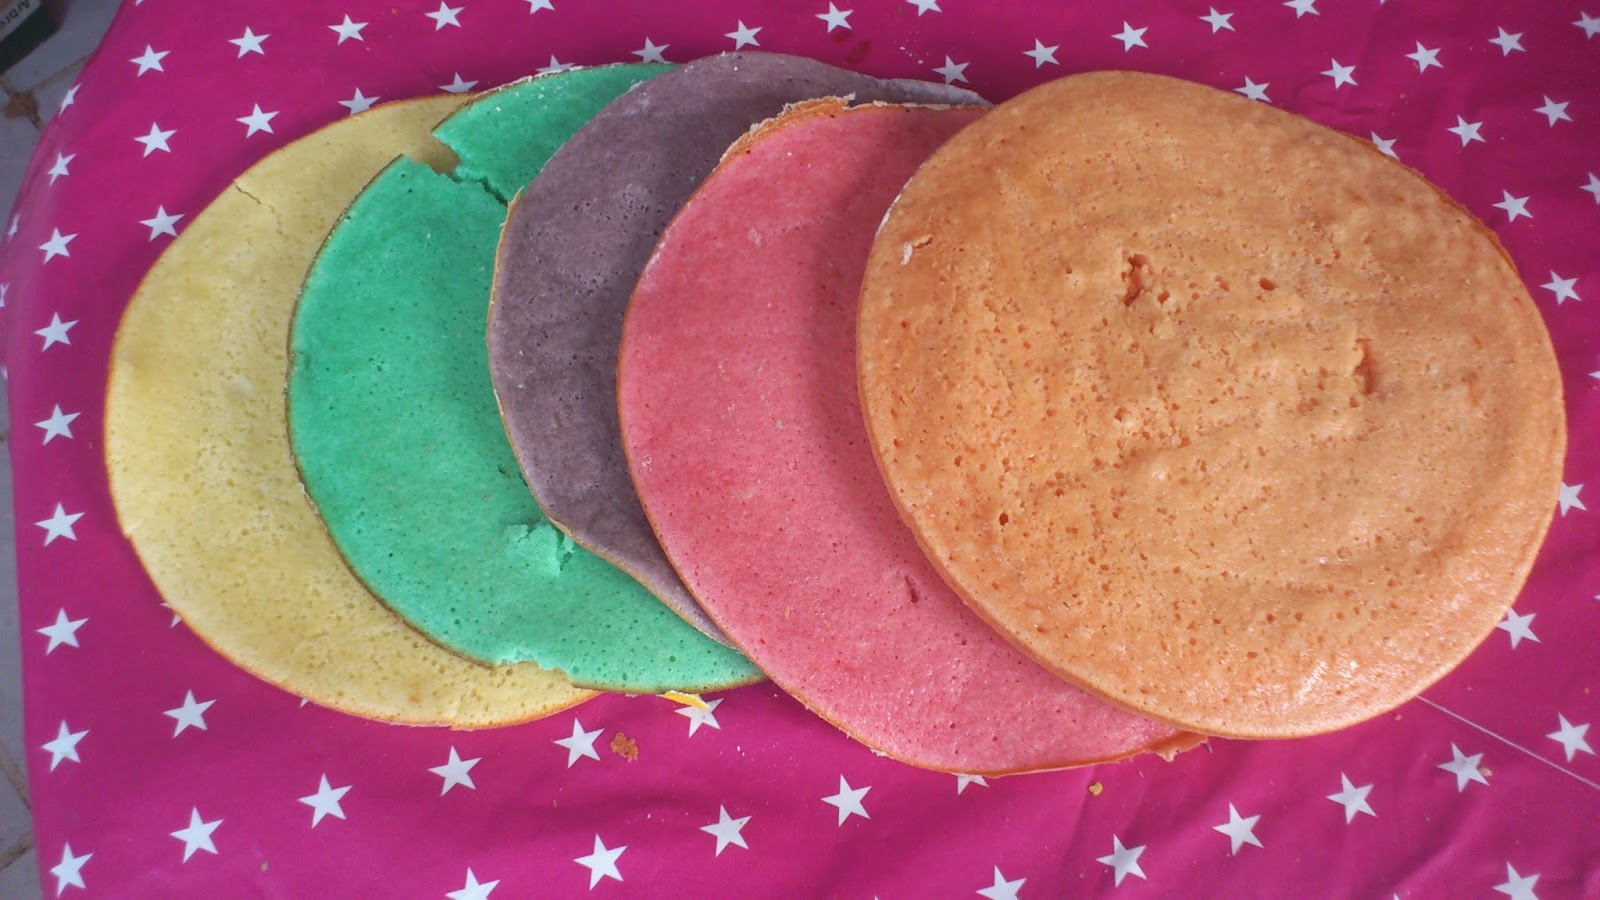 gateau gâteau rainbow colorants recette DIY arc-en-ciel cuisine patisserie